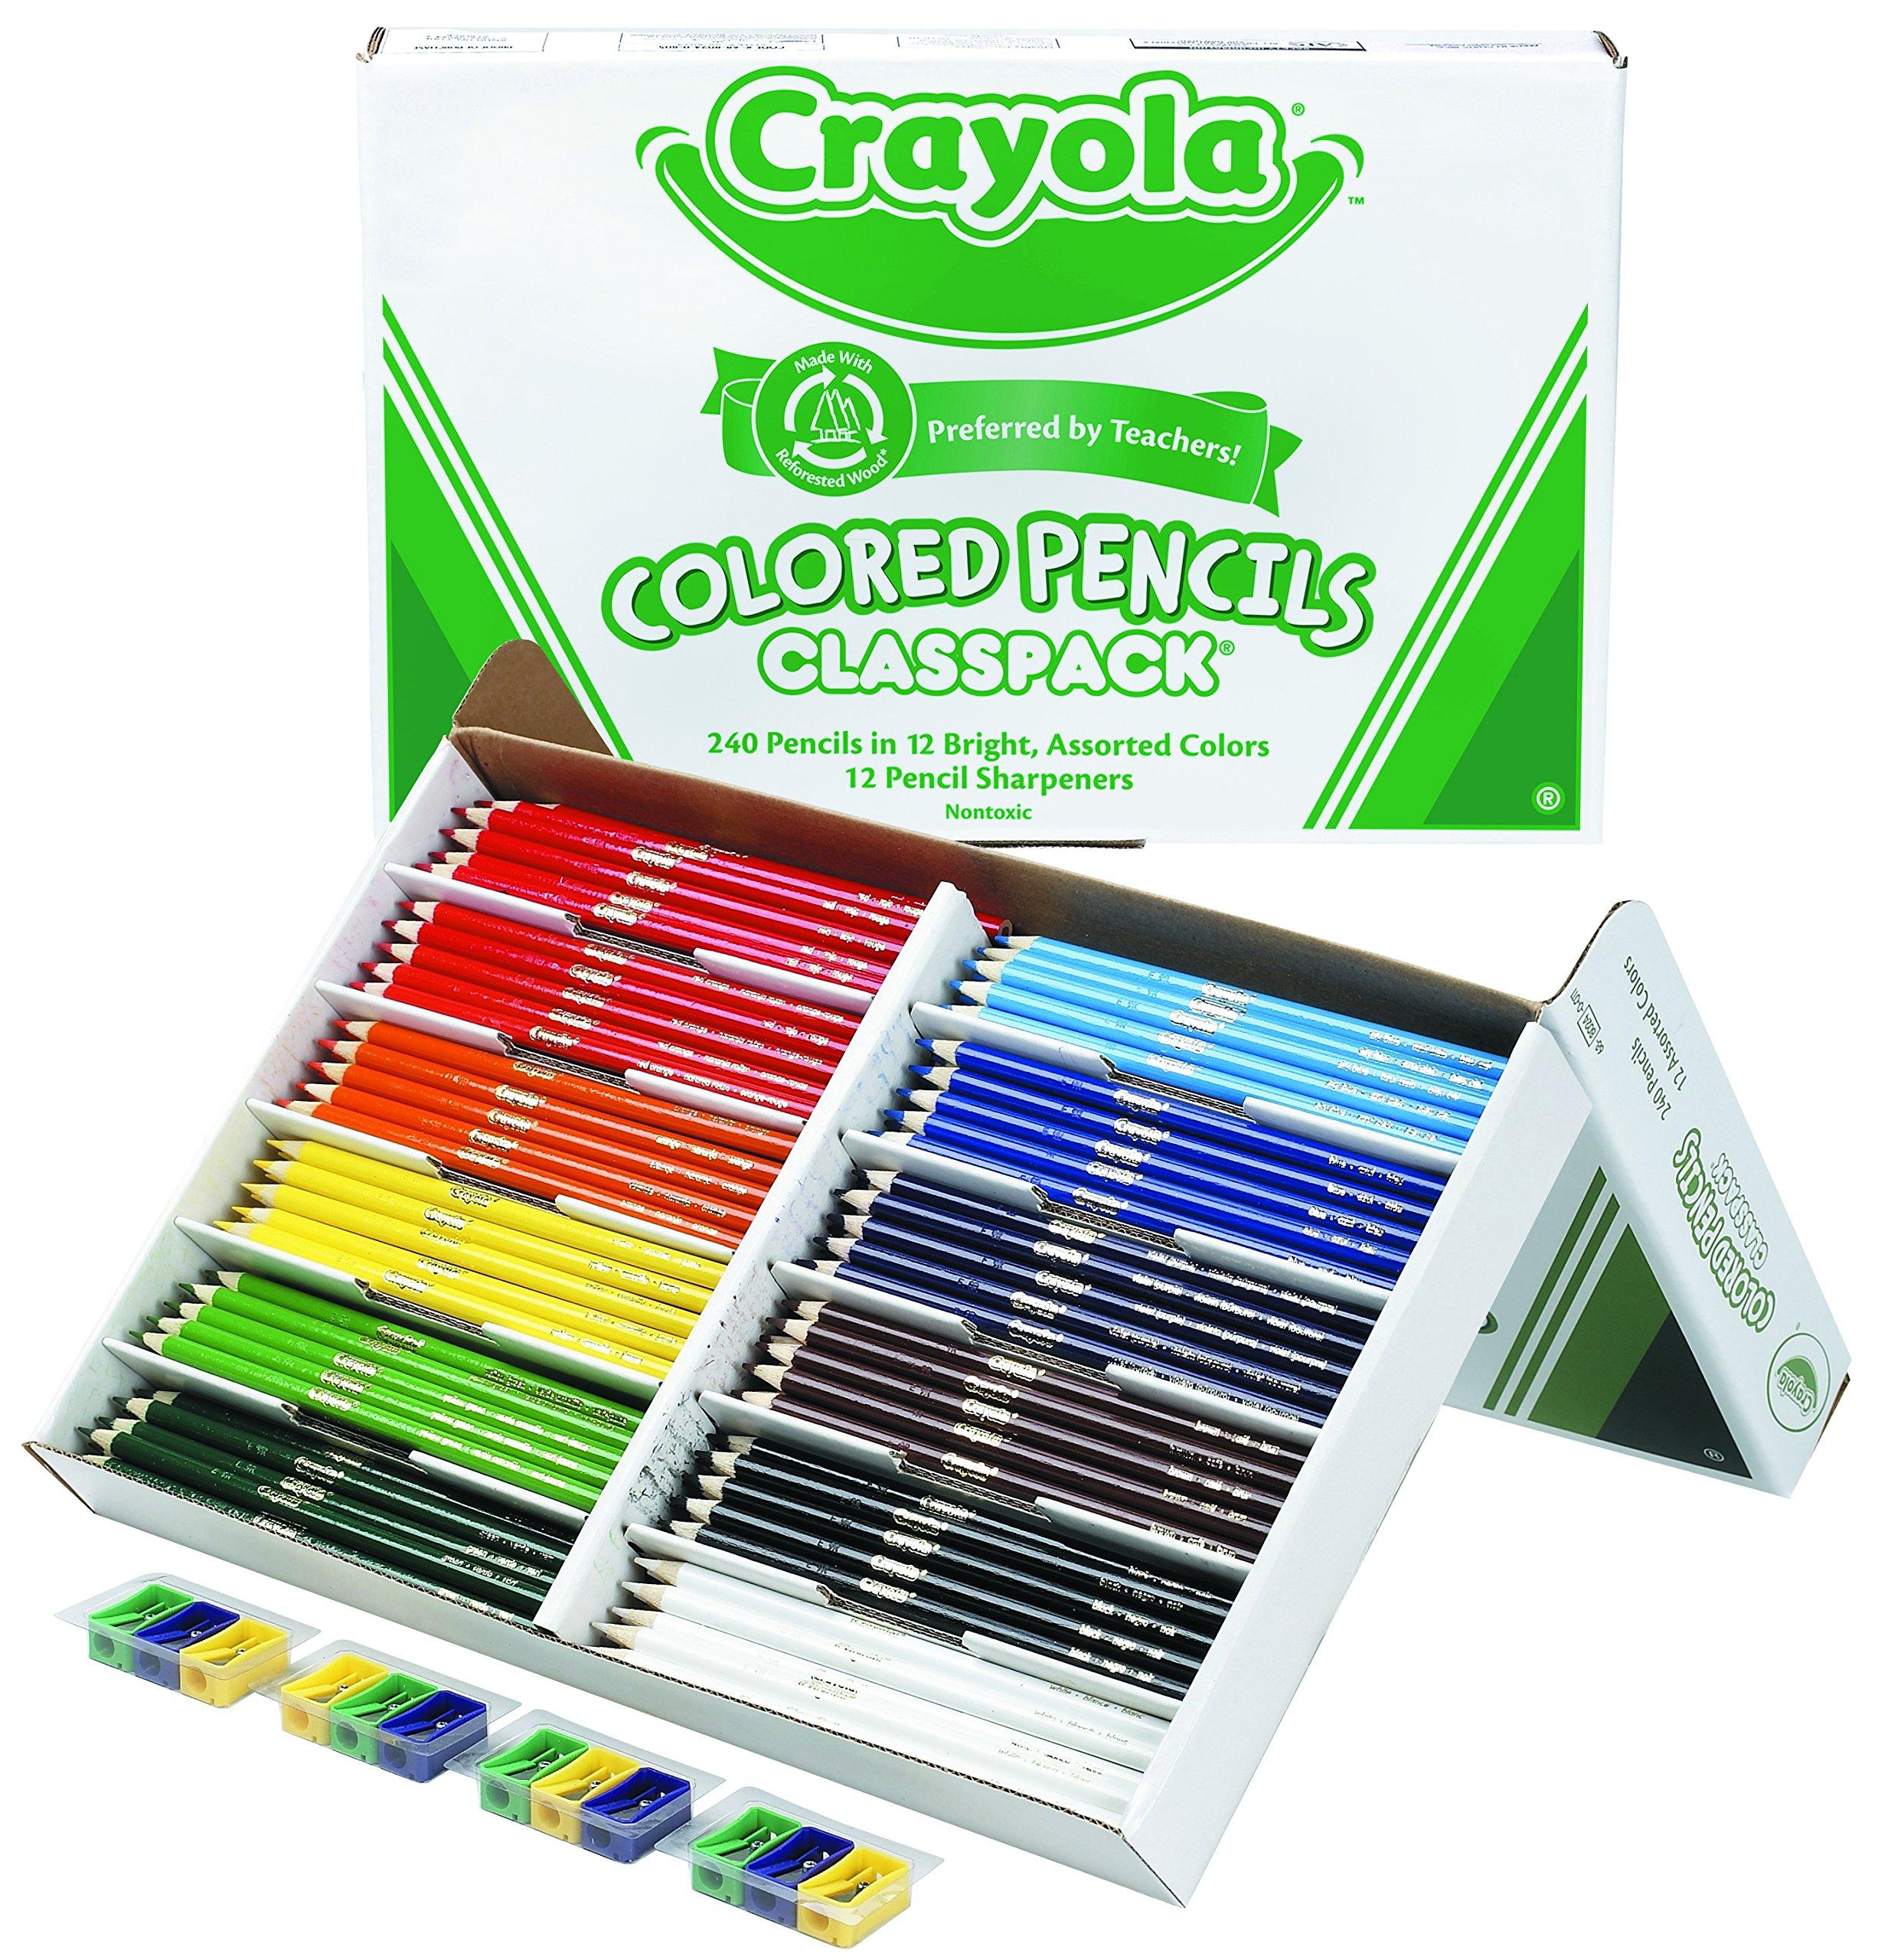 Crayola Colored Pencil Bulk, 240 Count Classpack, 12 Assorted Colors